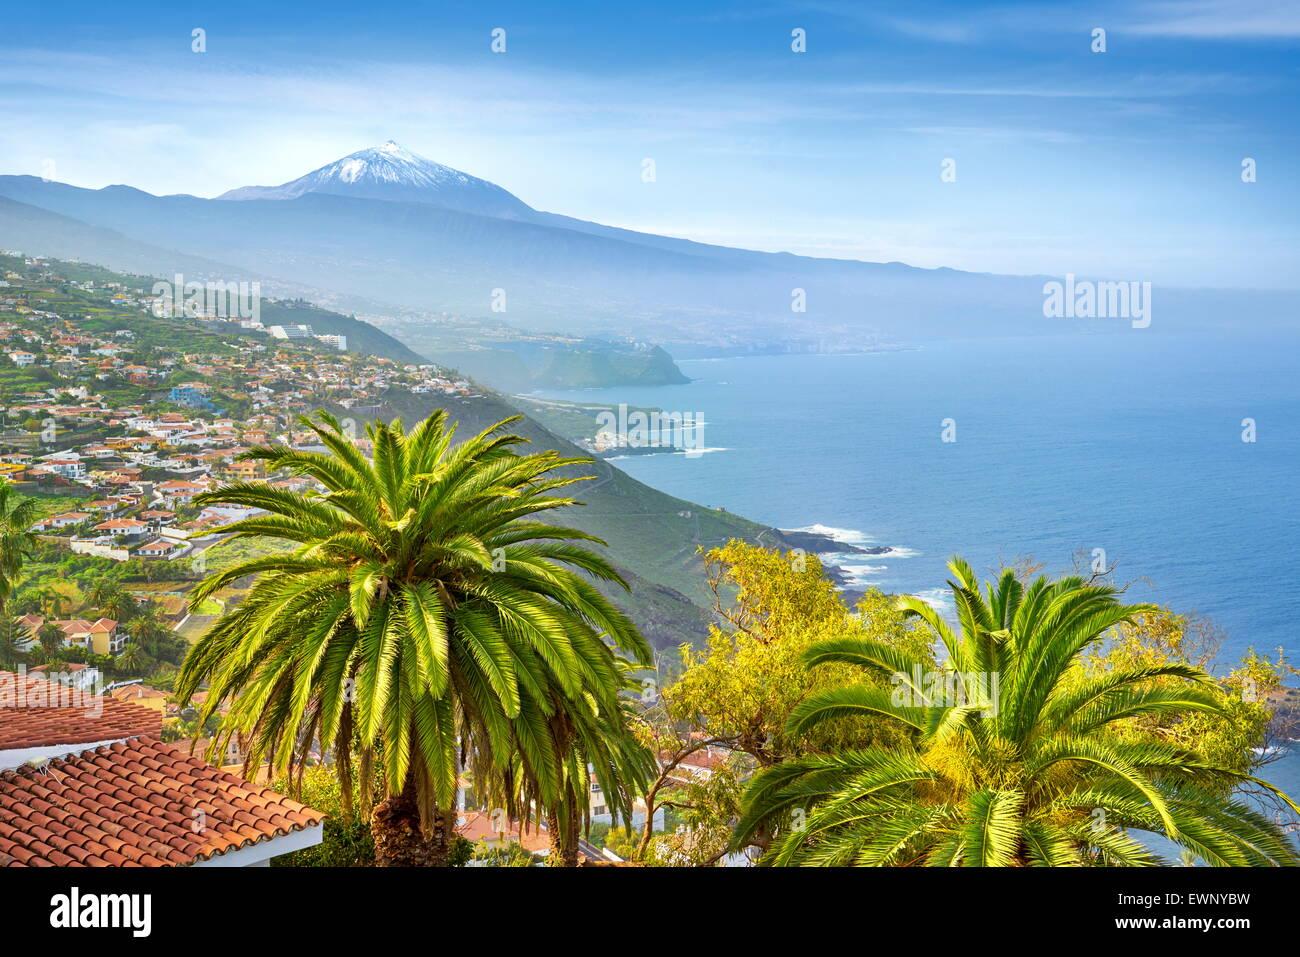 Costa norte de Tenerife, Islas Canarias, España Imagen De Stock